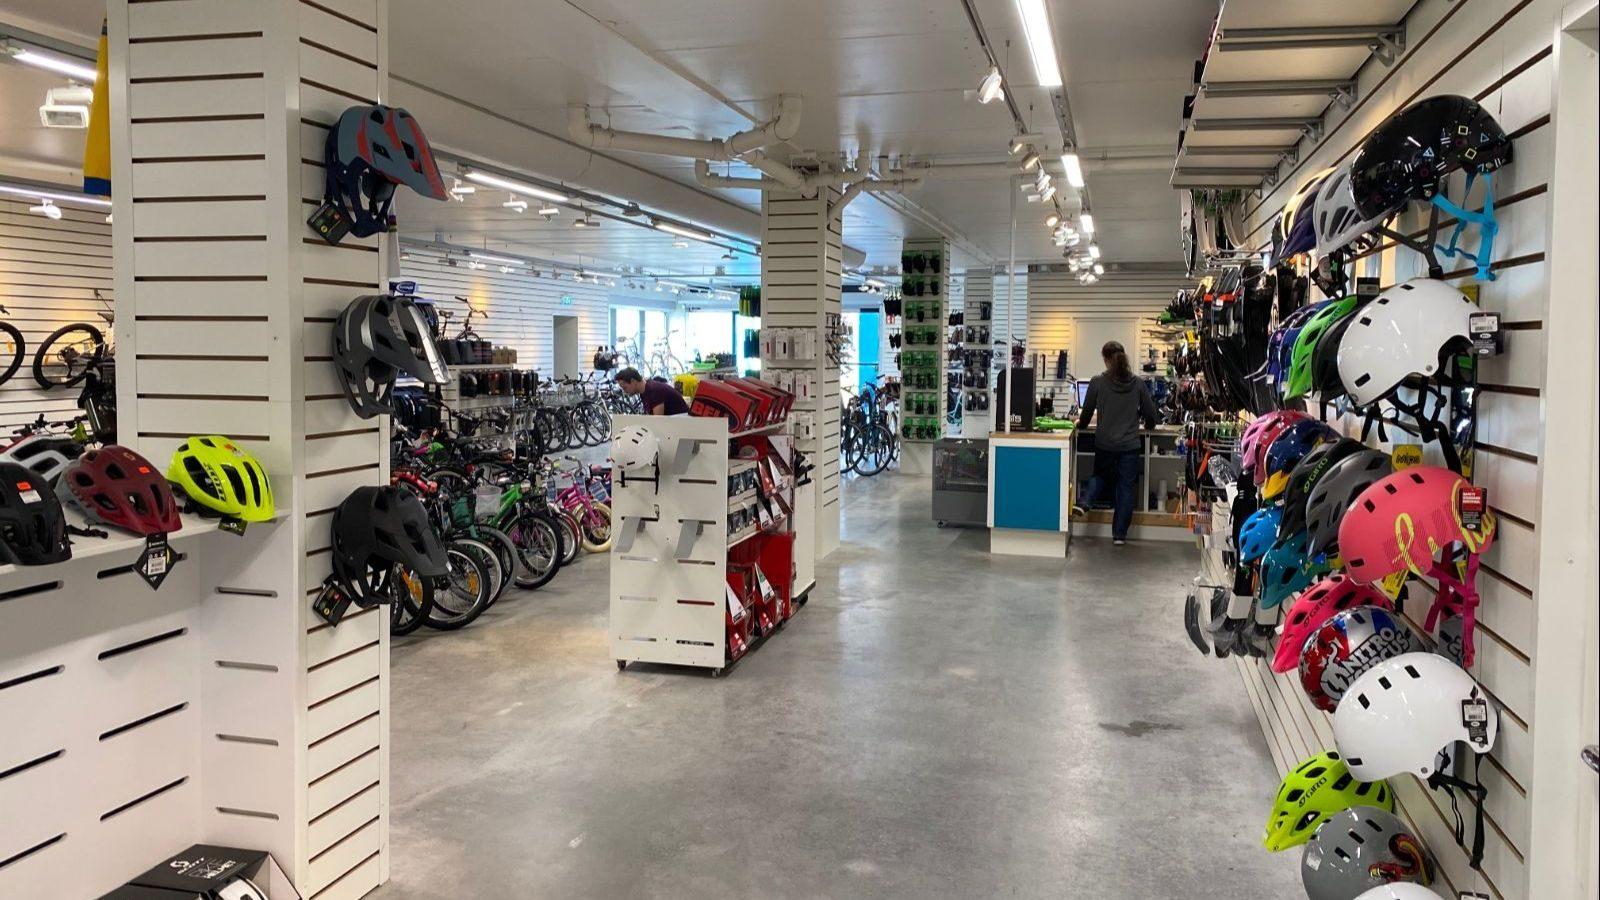 cykelhuset Uddevalla 1600x900 06